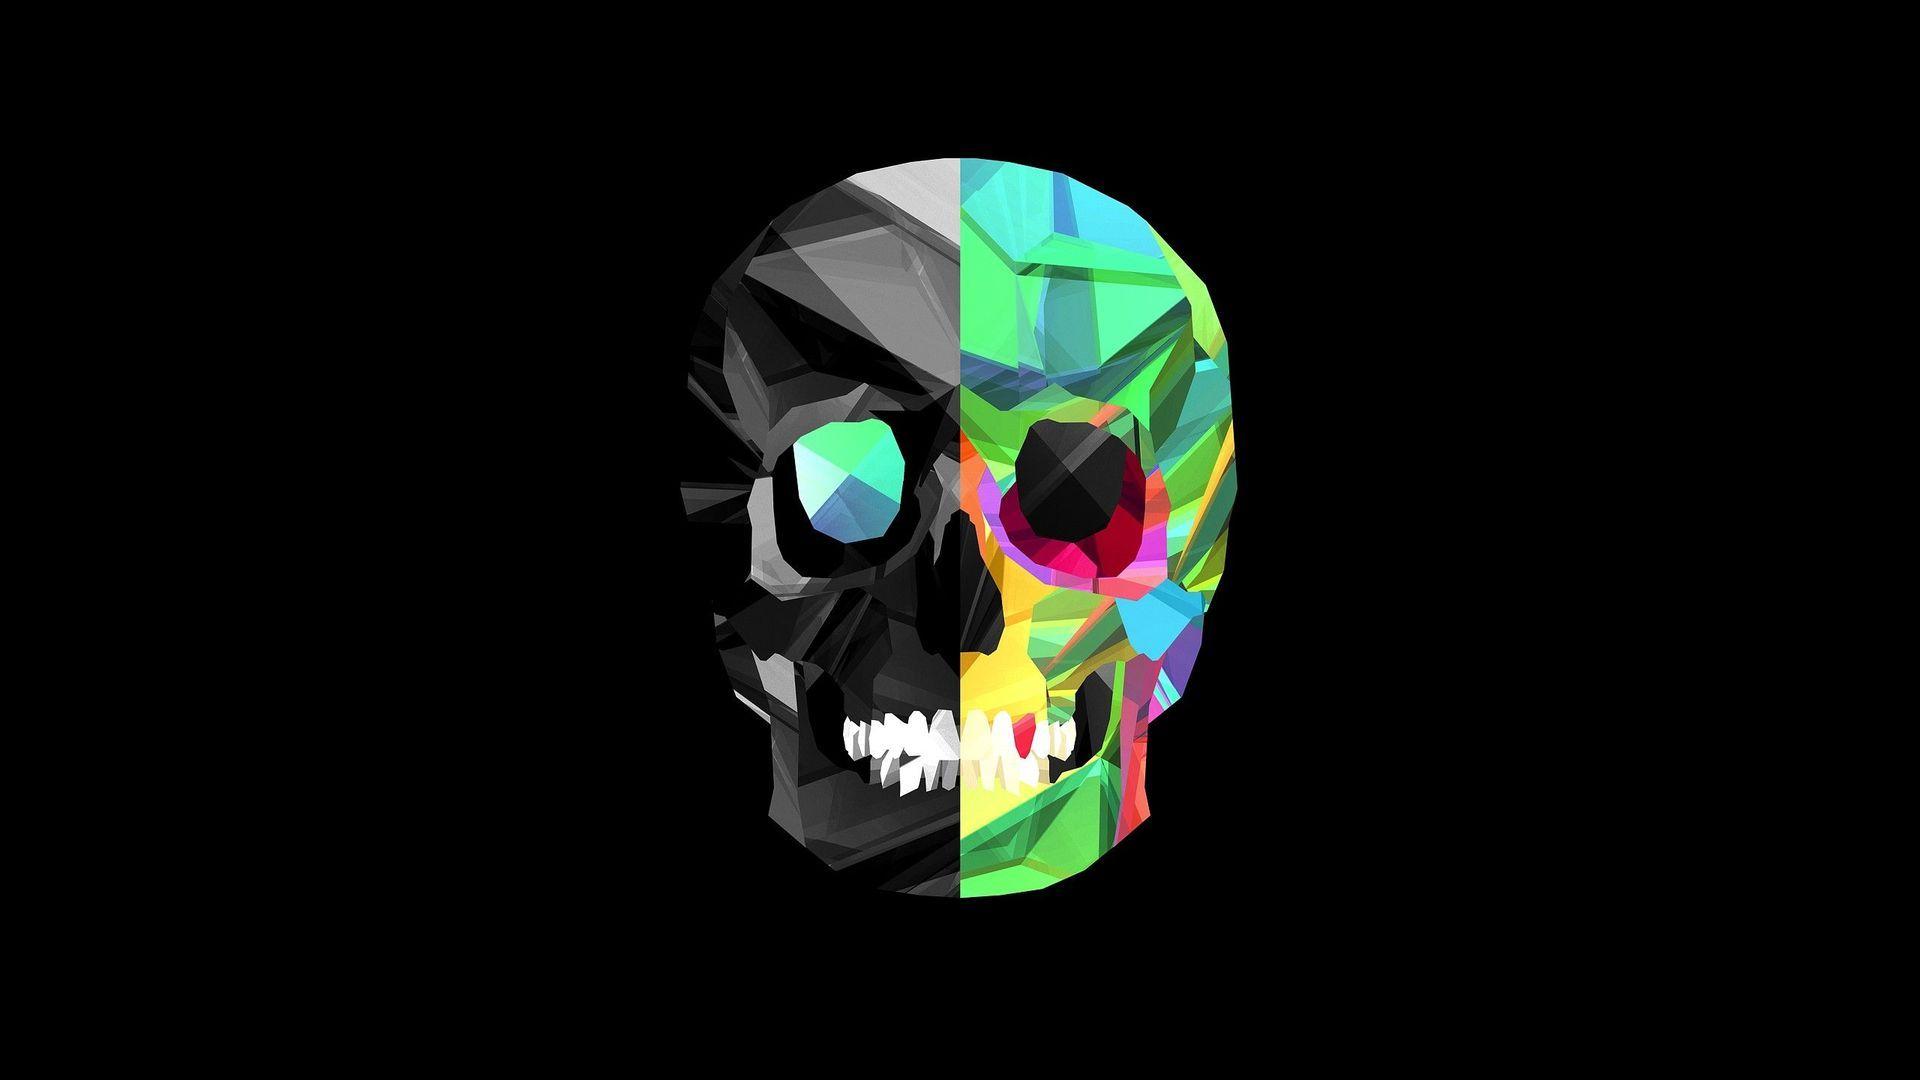 Black Wallpapers Matter Post Skull Wallpaper Cool Desktop Wallpapers Hd Skull Wallpapers